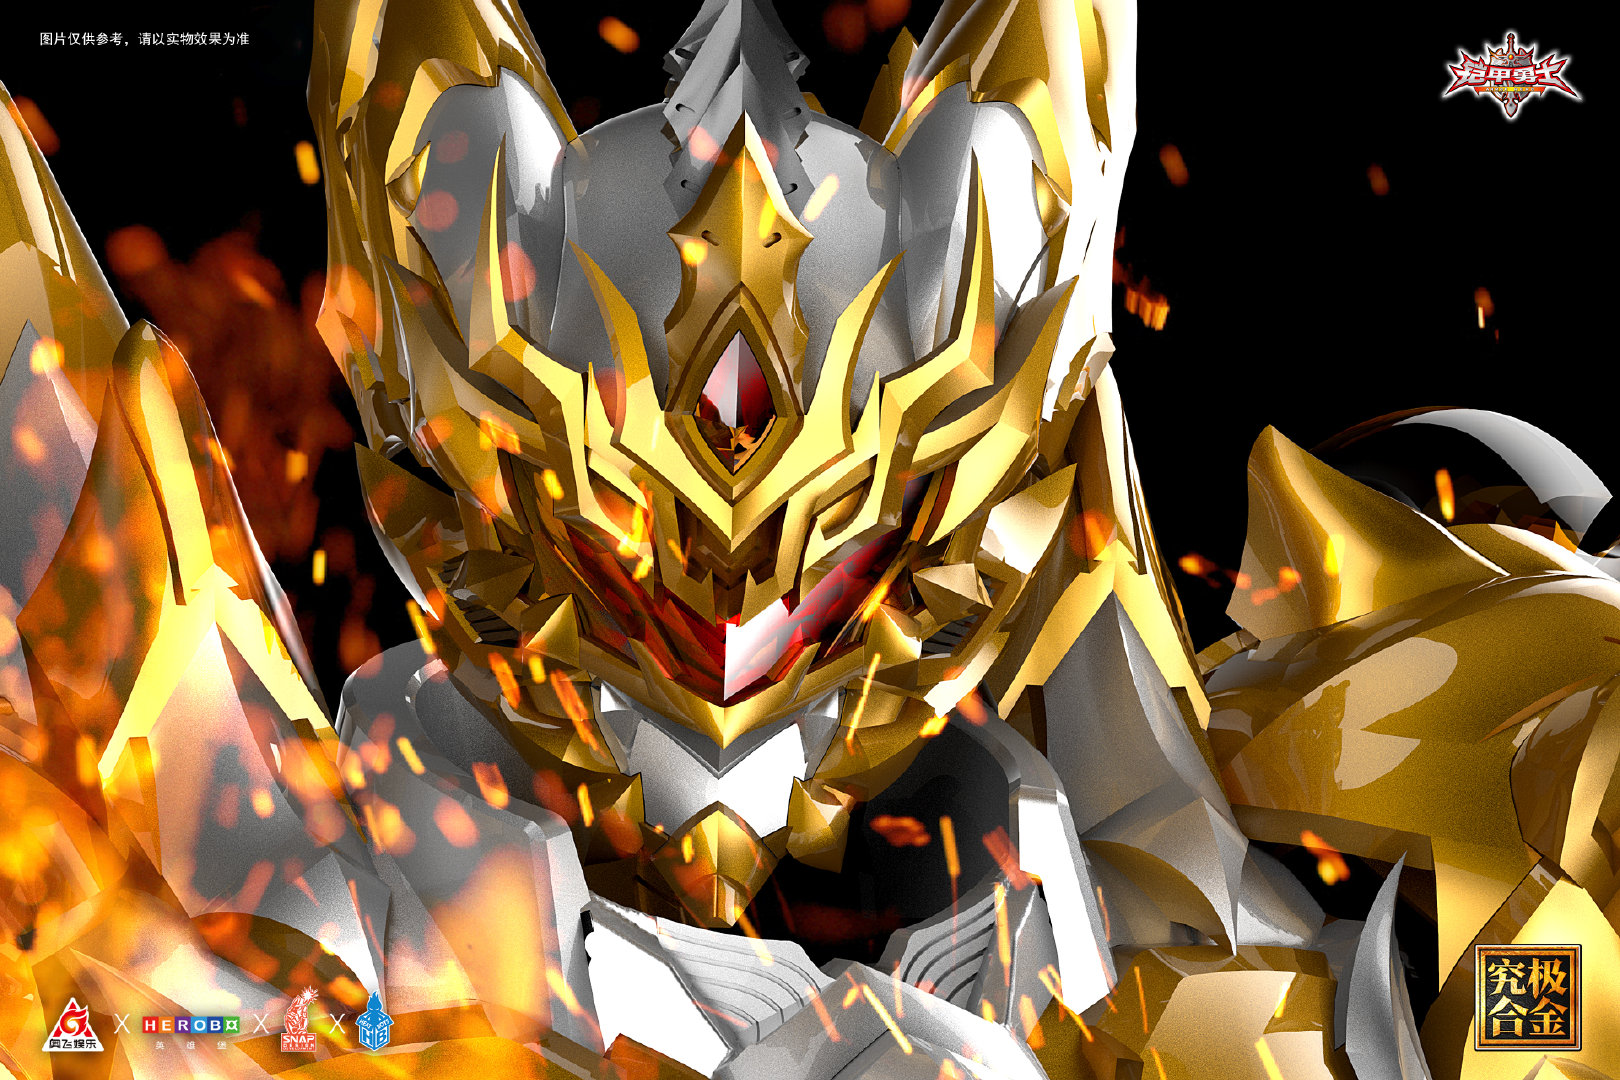 S535_Armor_hero_Emperor_033.jpg